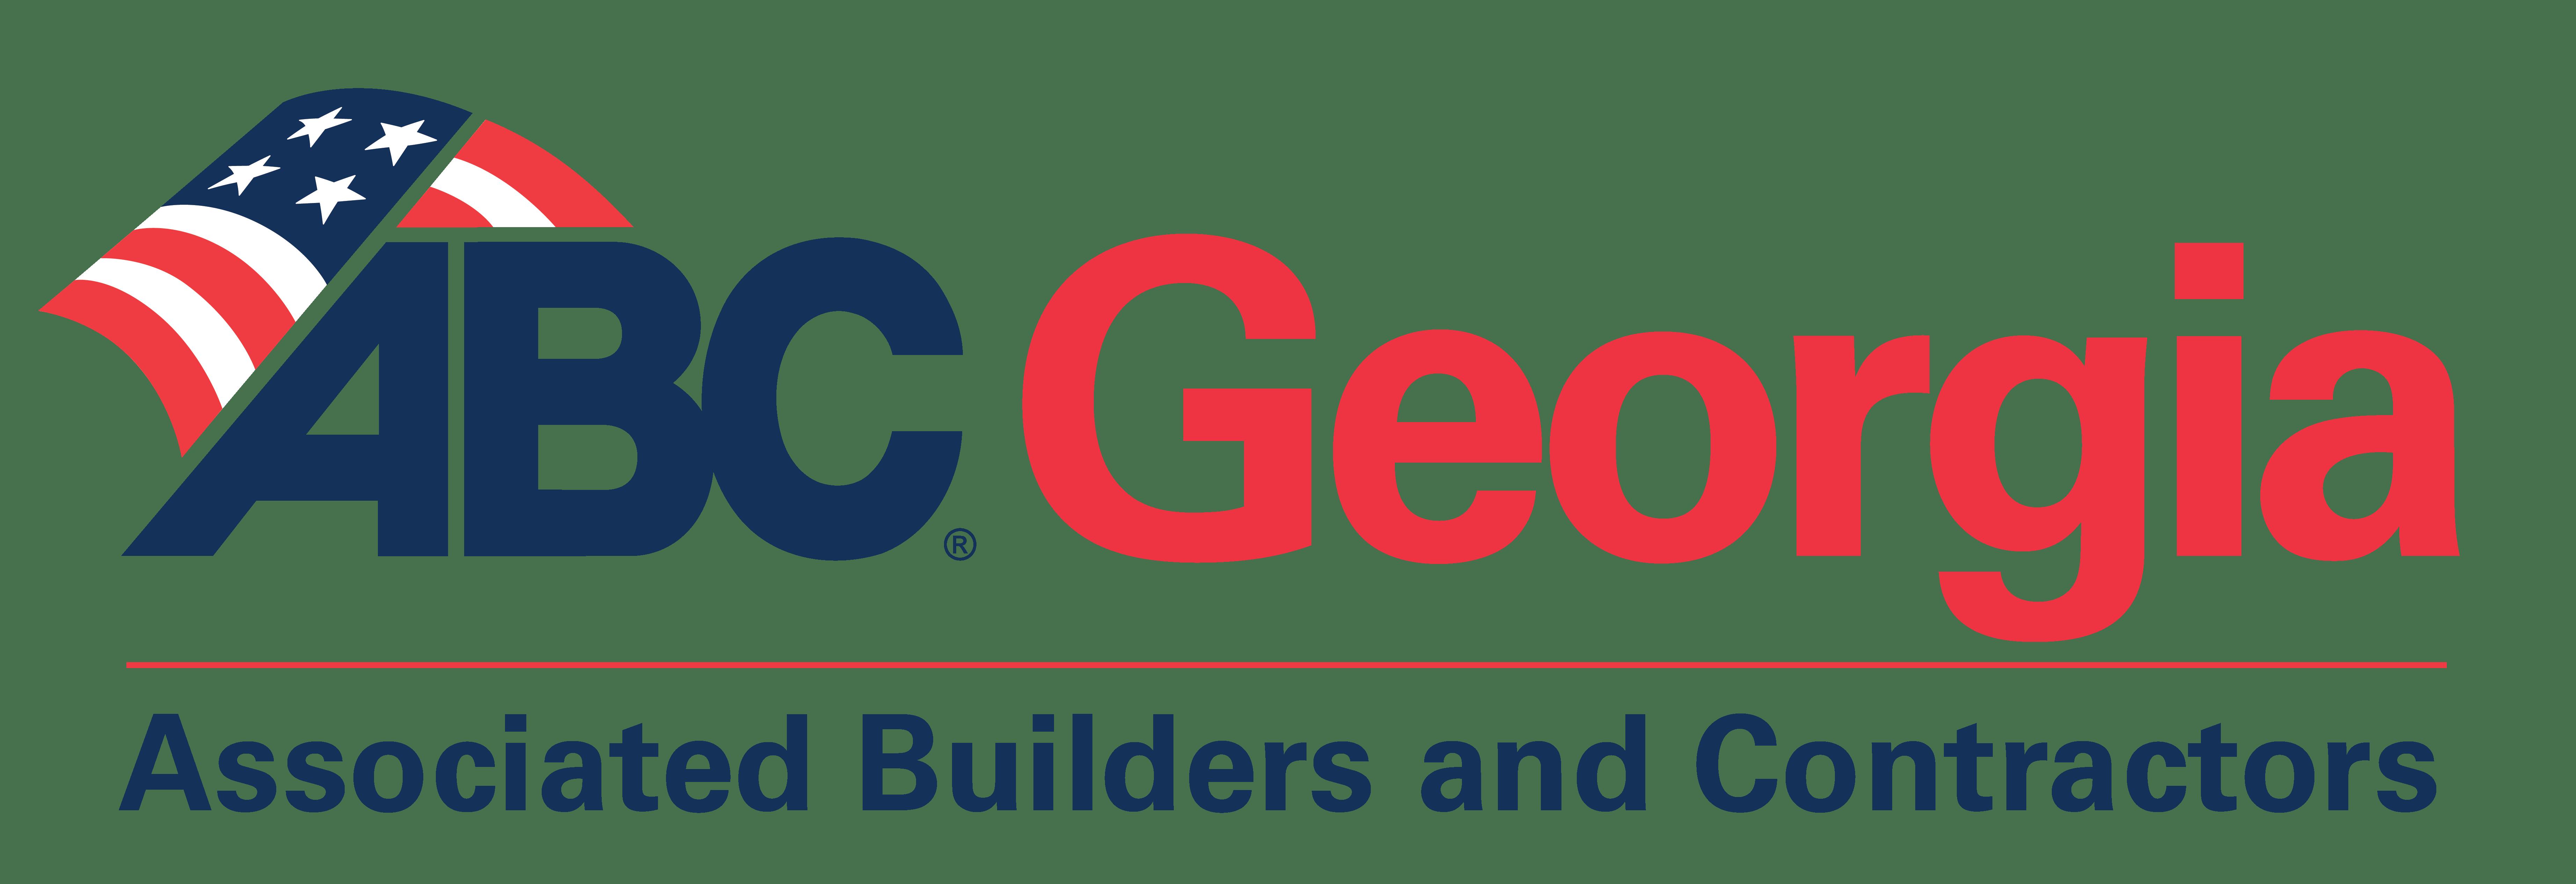 Associated Builders and Contractors Georgia logo